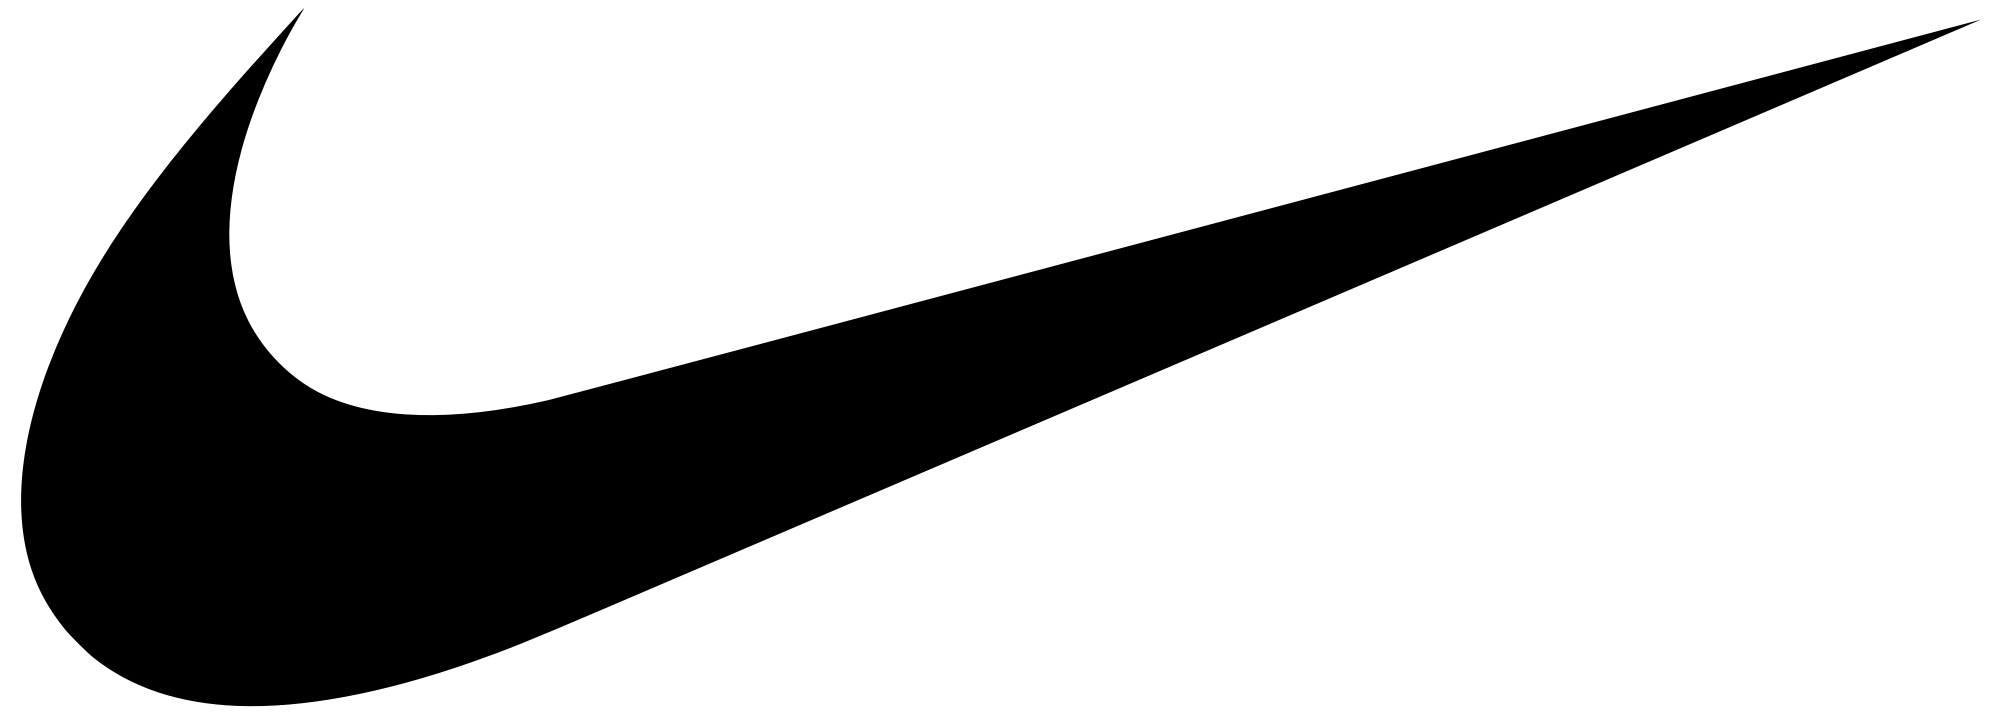 Temporizador Bronceado Automatización  Download Nike Swoosh Logo Png   PNG & GIF BASE